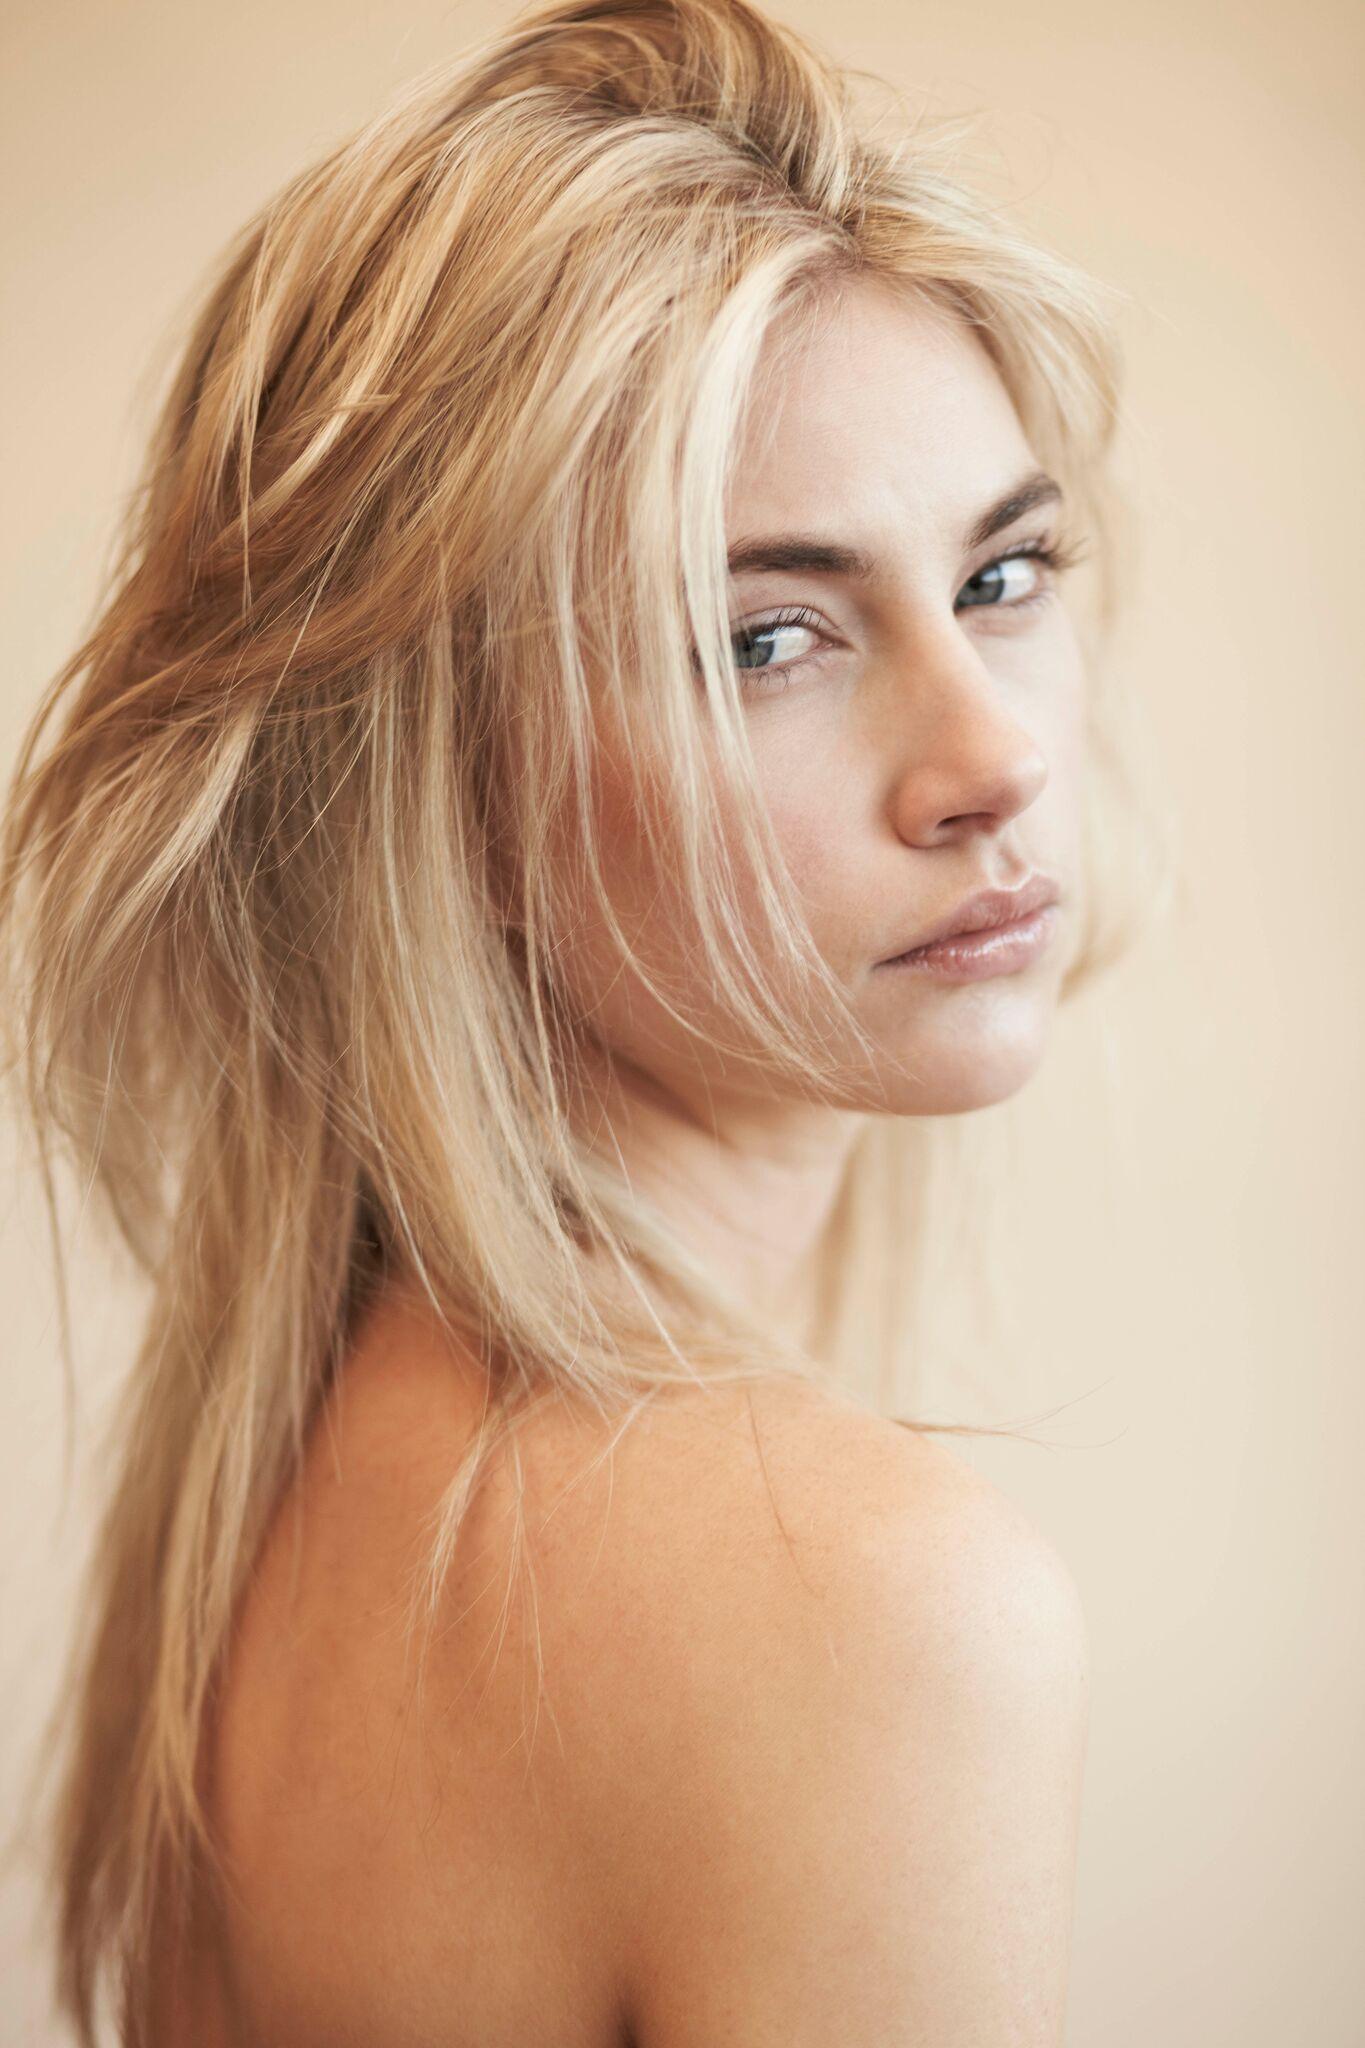 Image - Ryan Brabazon | Model - Cassie Matthews | Makeup - Emmily Banks